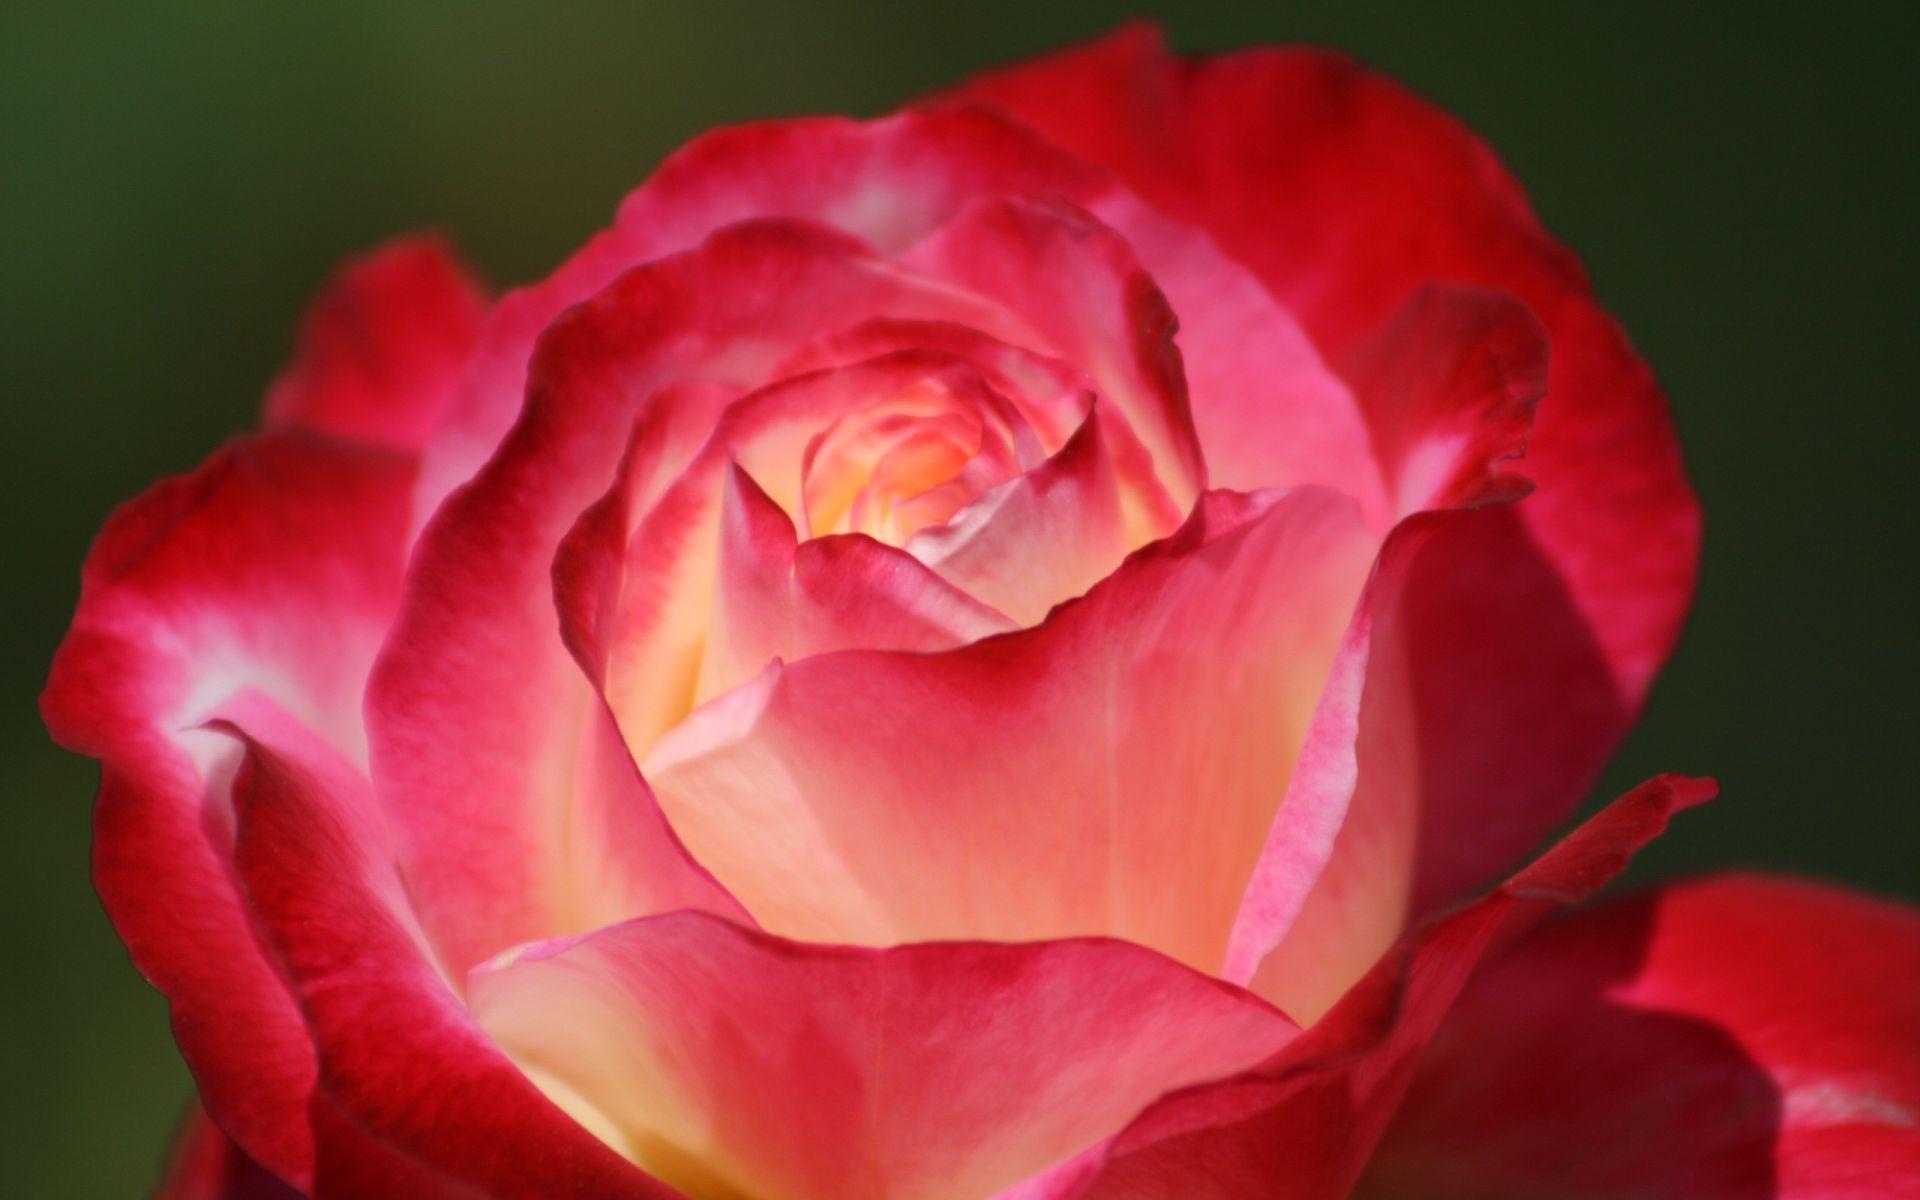 Red Rose Close Up beautiful wallpaper